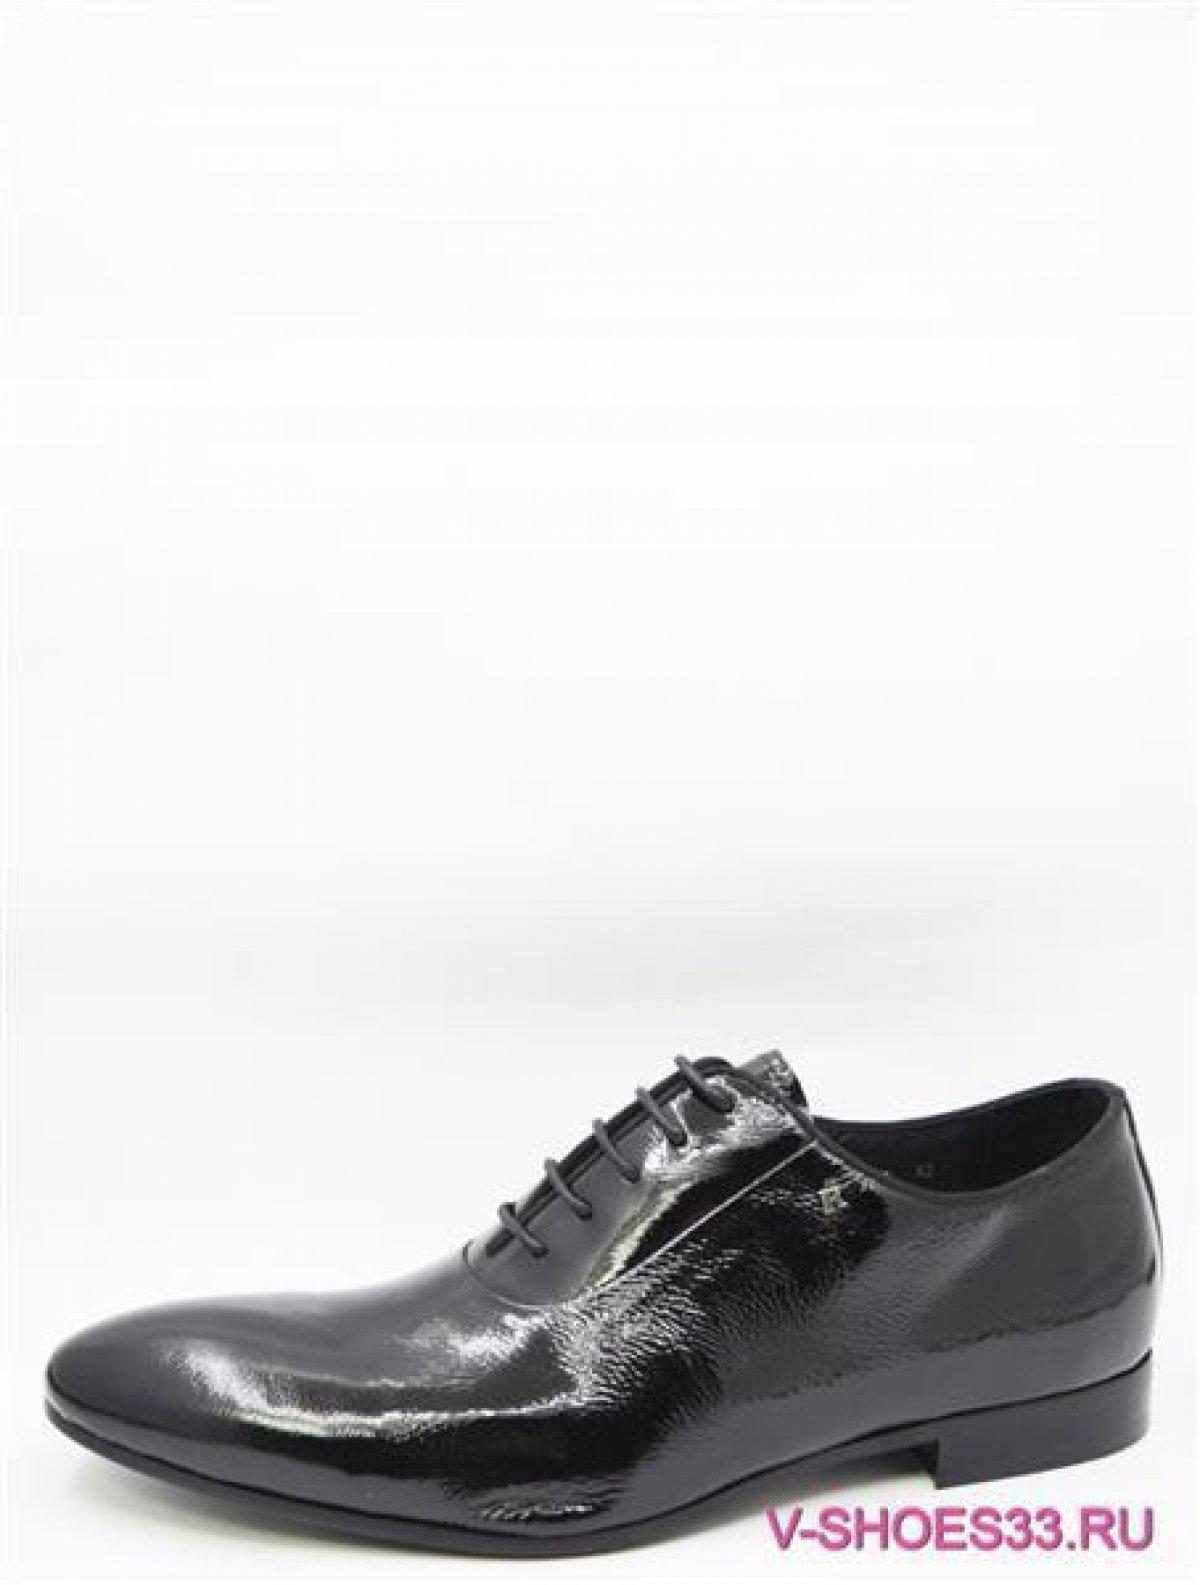 S83-075711 мужские туфли